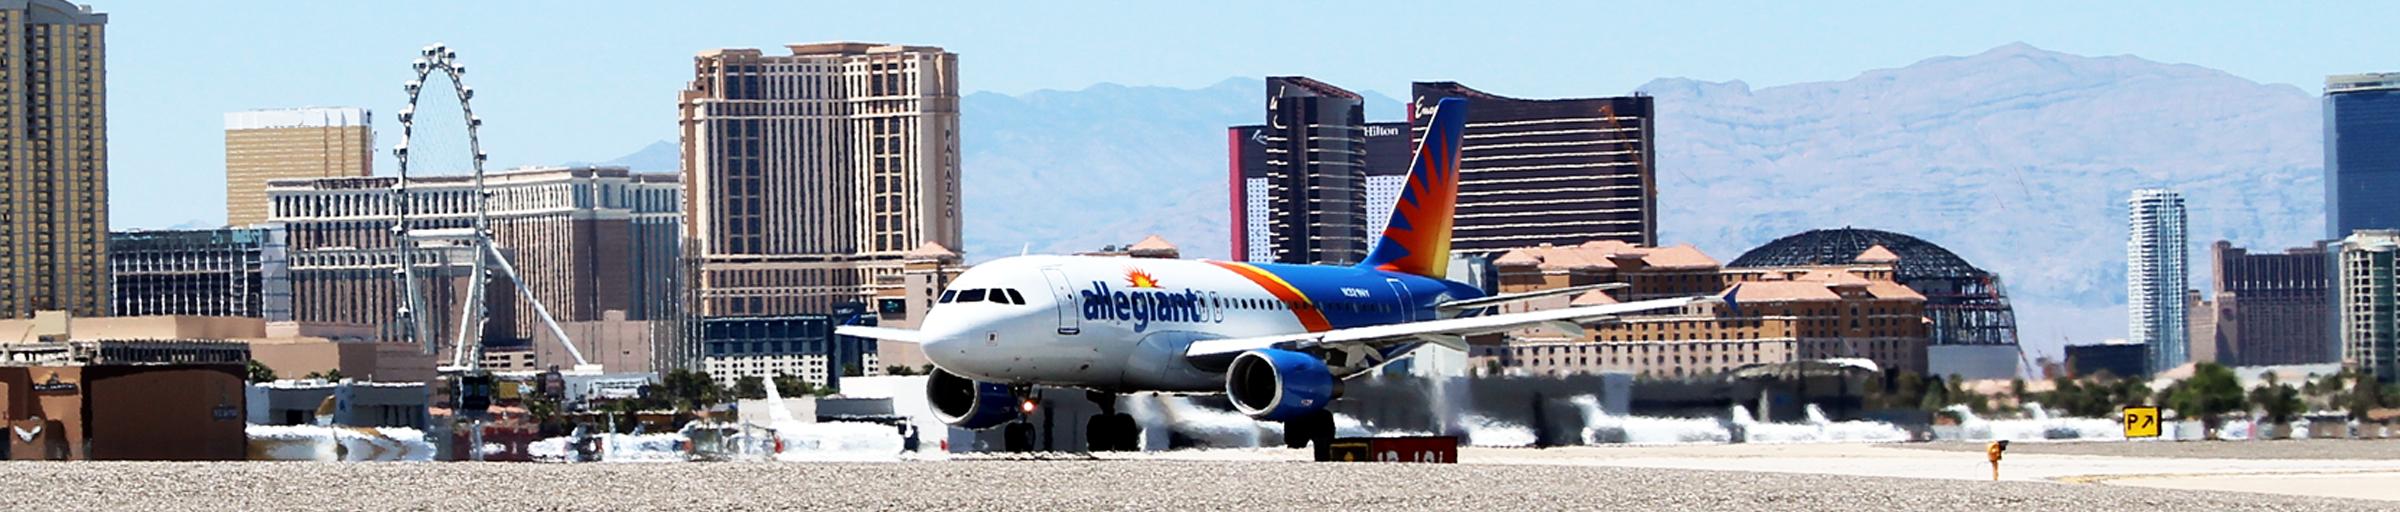 Allegiant at McCarran International Airport